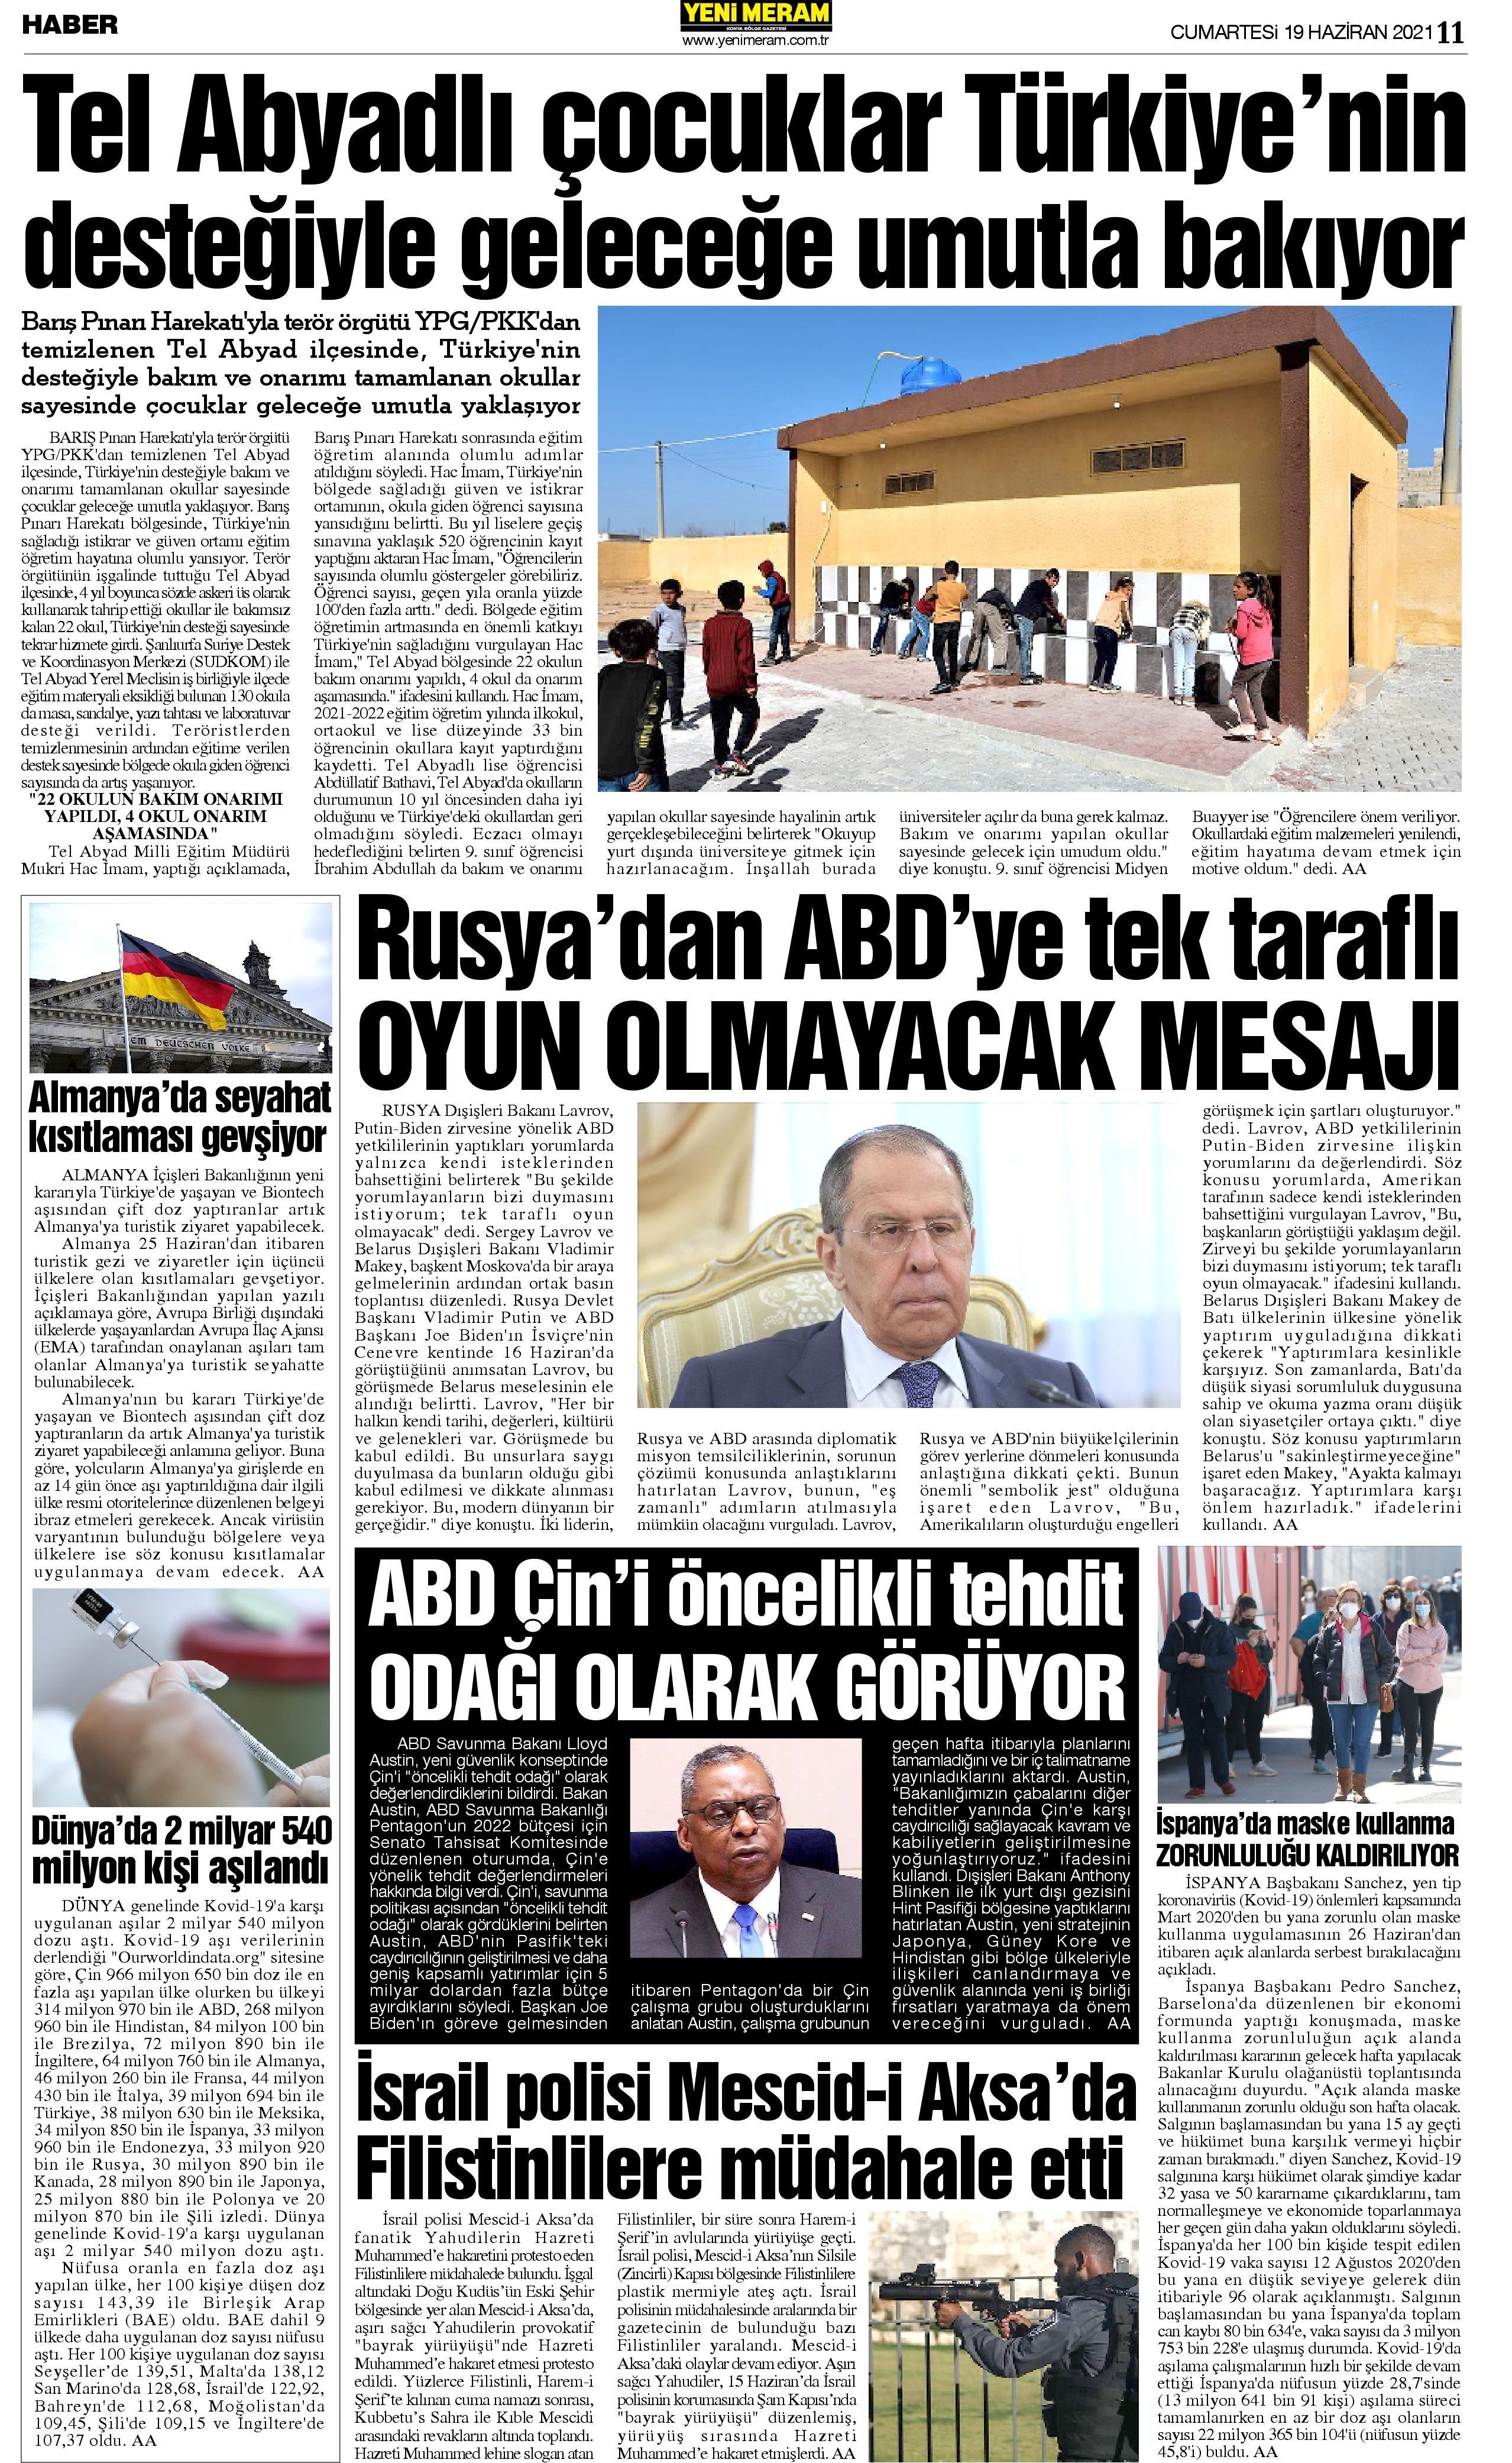 19 Haziran 2021 Yeni Meram Gazetesi